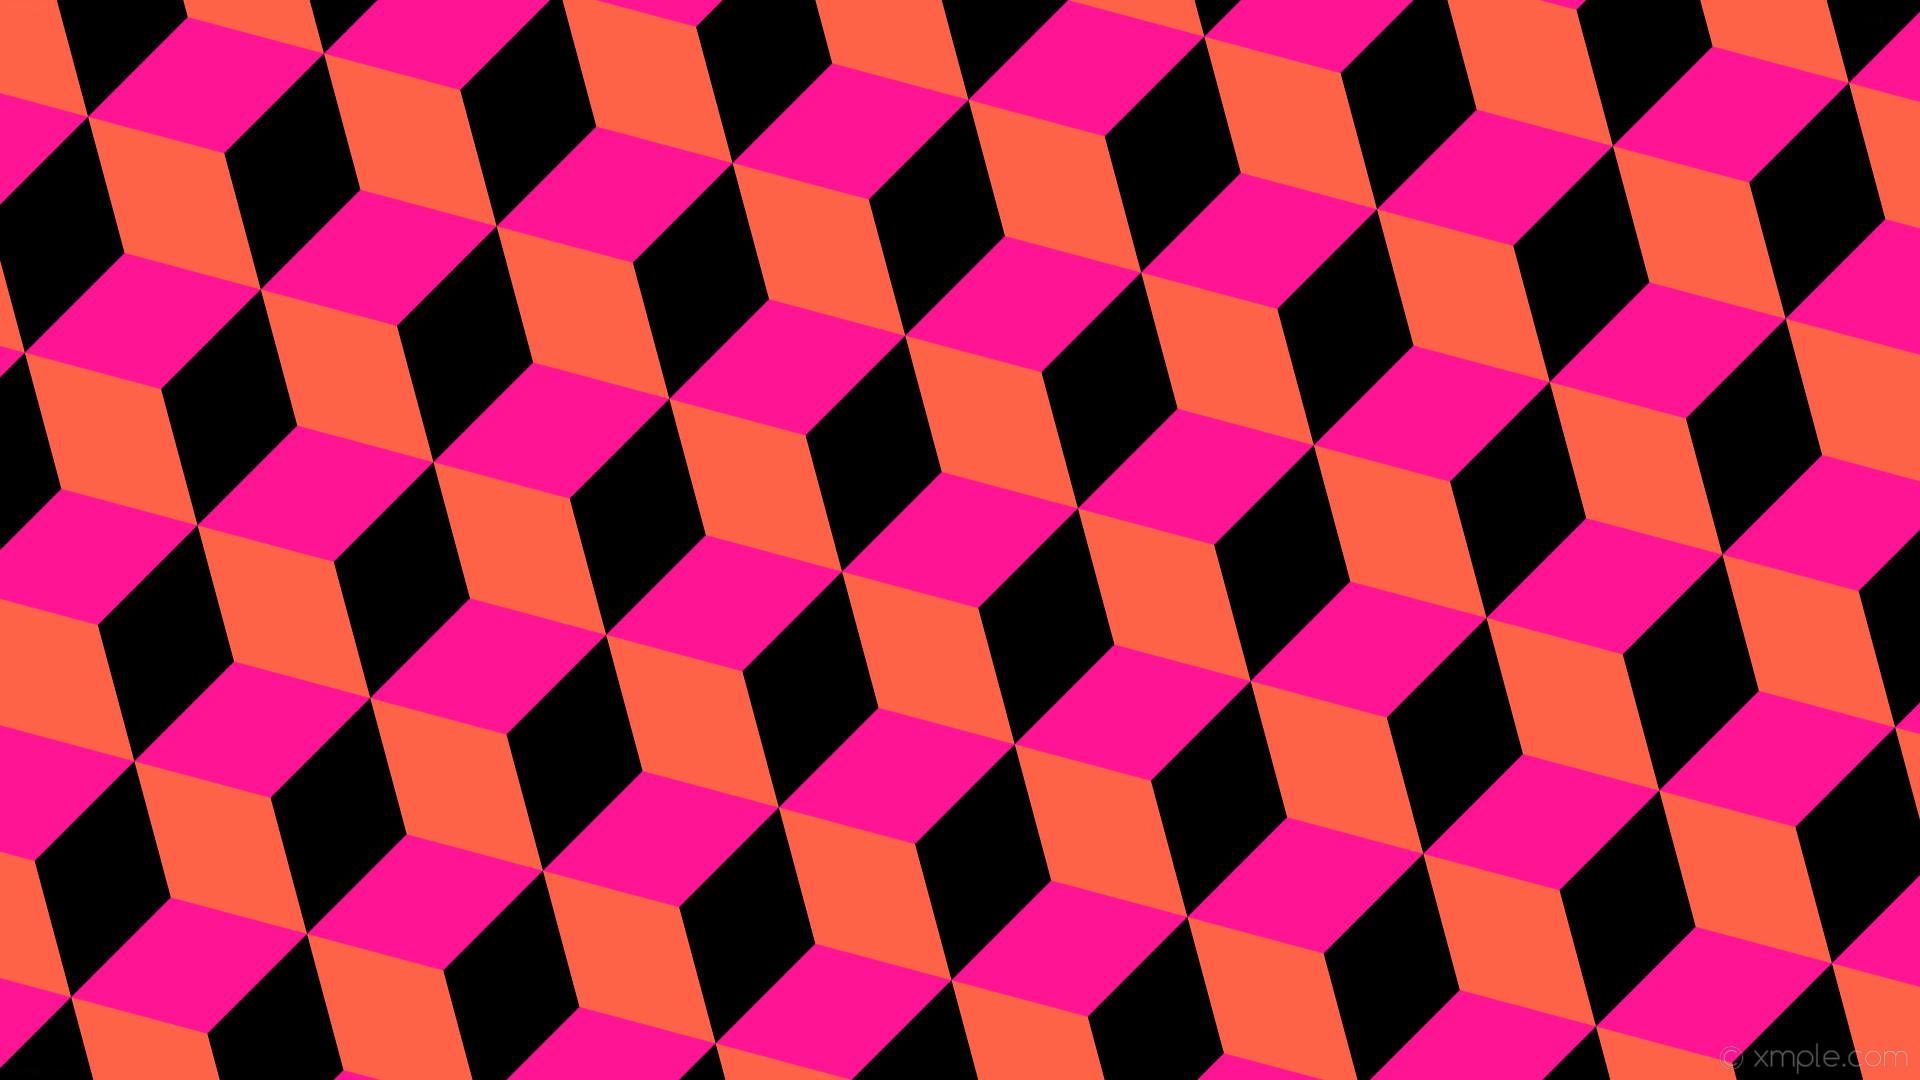 wallpaper black 3d cubes pink orange deep pink tomato #ff1493 #ff6347  #000000 195